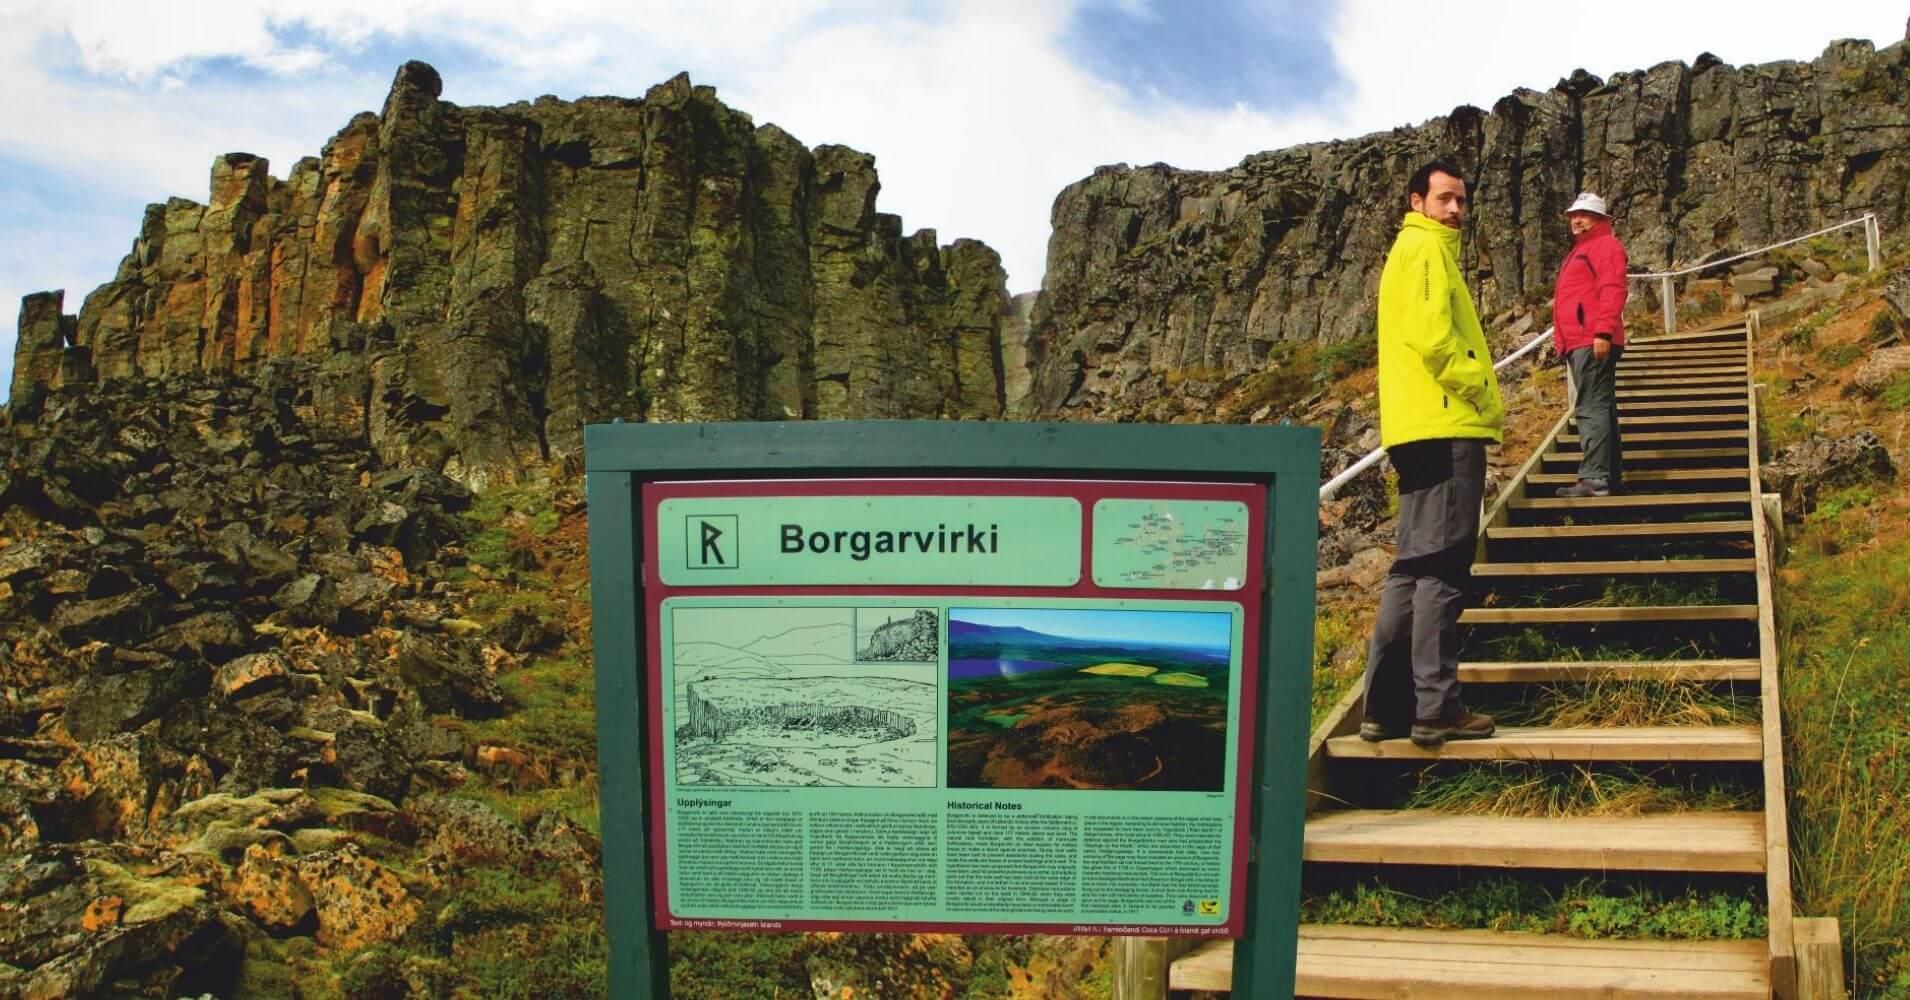 Columnas Volcánicas de Borgarvirki. Península de Vatnsnes. Norðurland Vestra. Islandia.